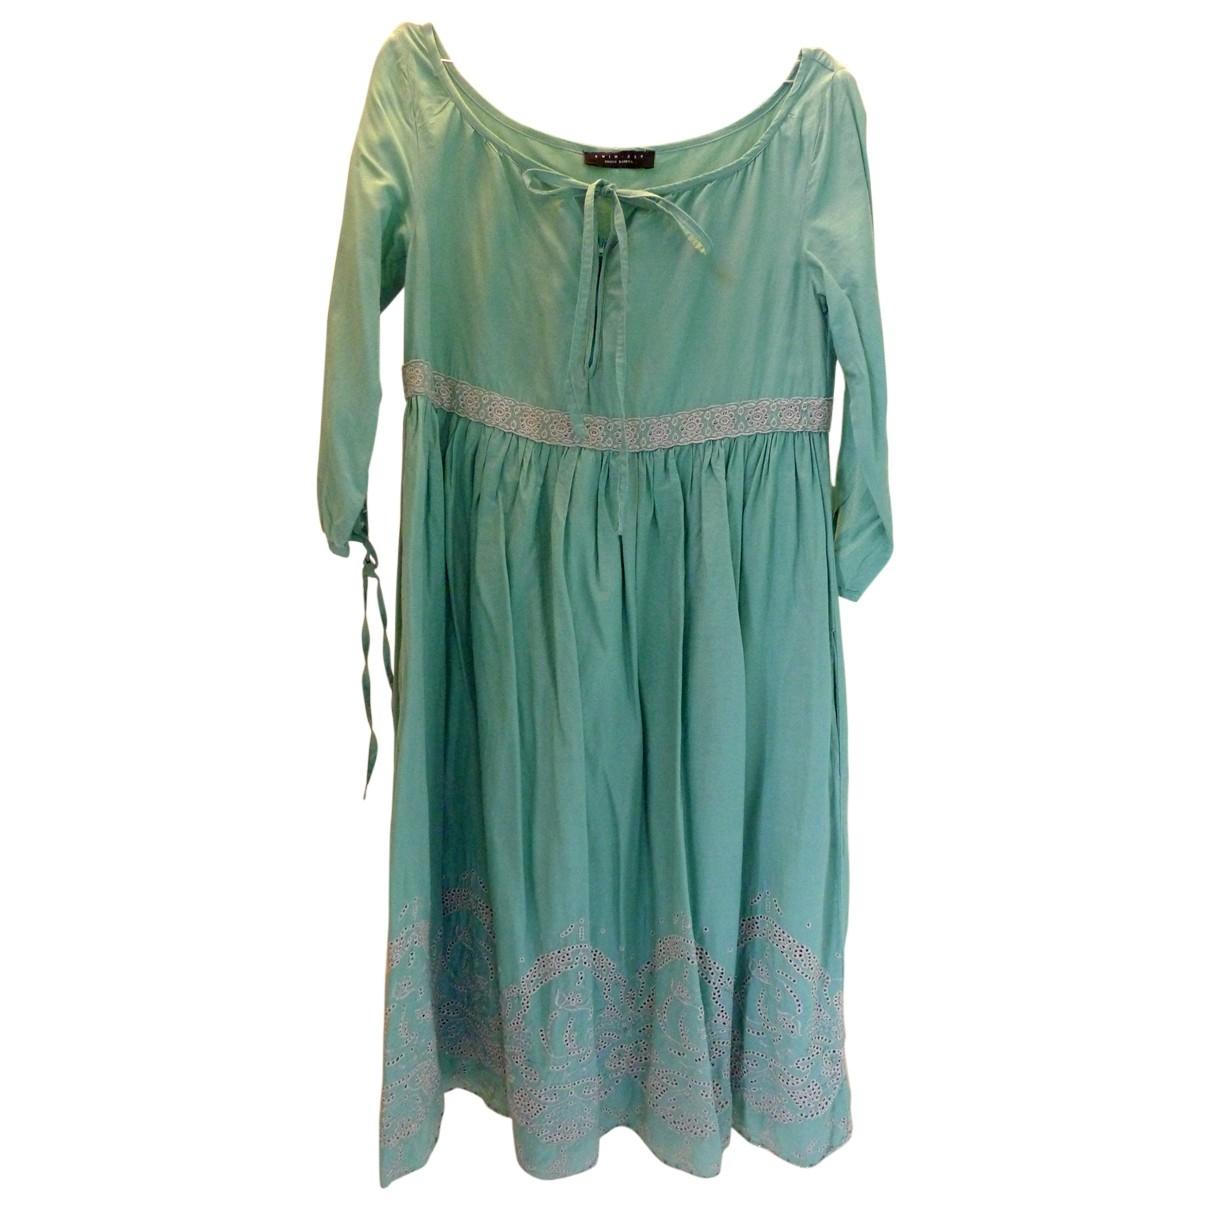 Twin Set \N Turquoise Cotton dress for Women M International